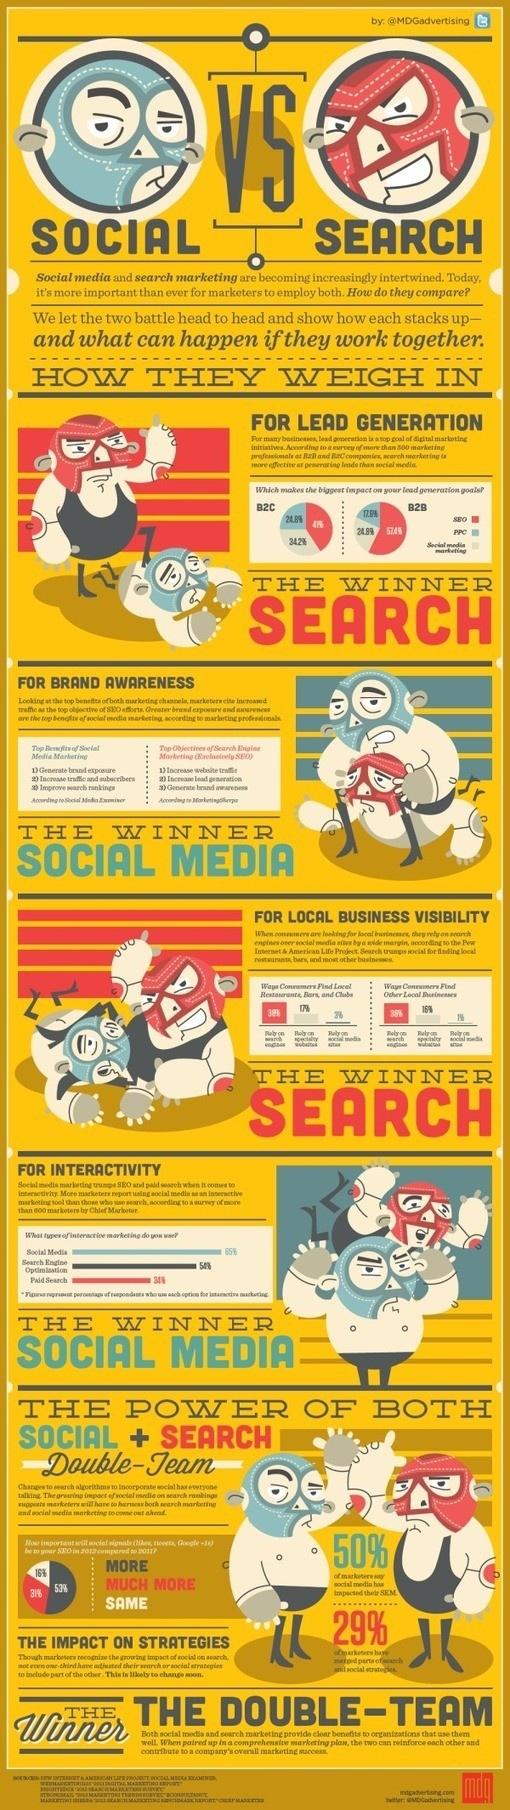 social-vs-search